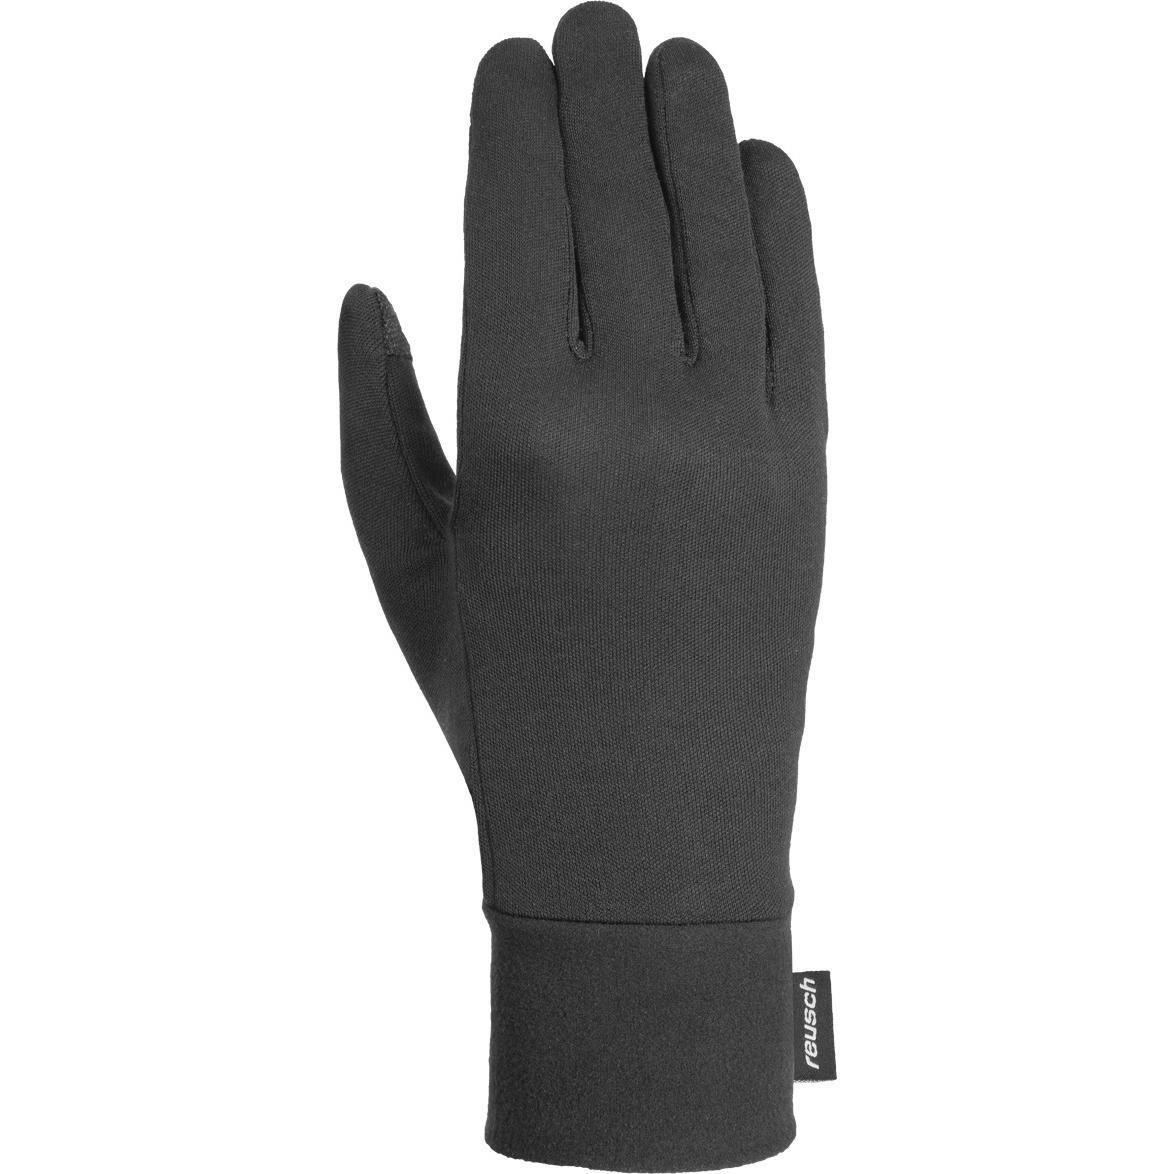 Перчатки Горные Reusch 2019-20 Silk Liner Touch-Tec™ Black (Inch (Дюйм):6,5)